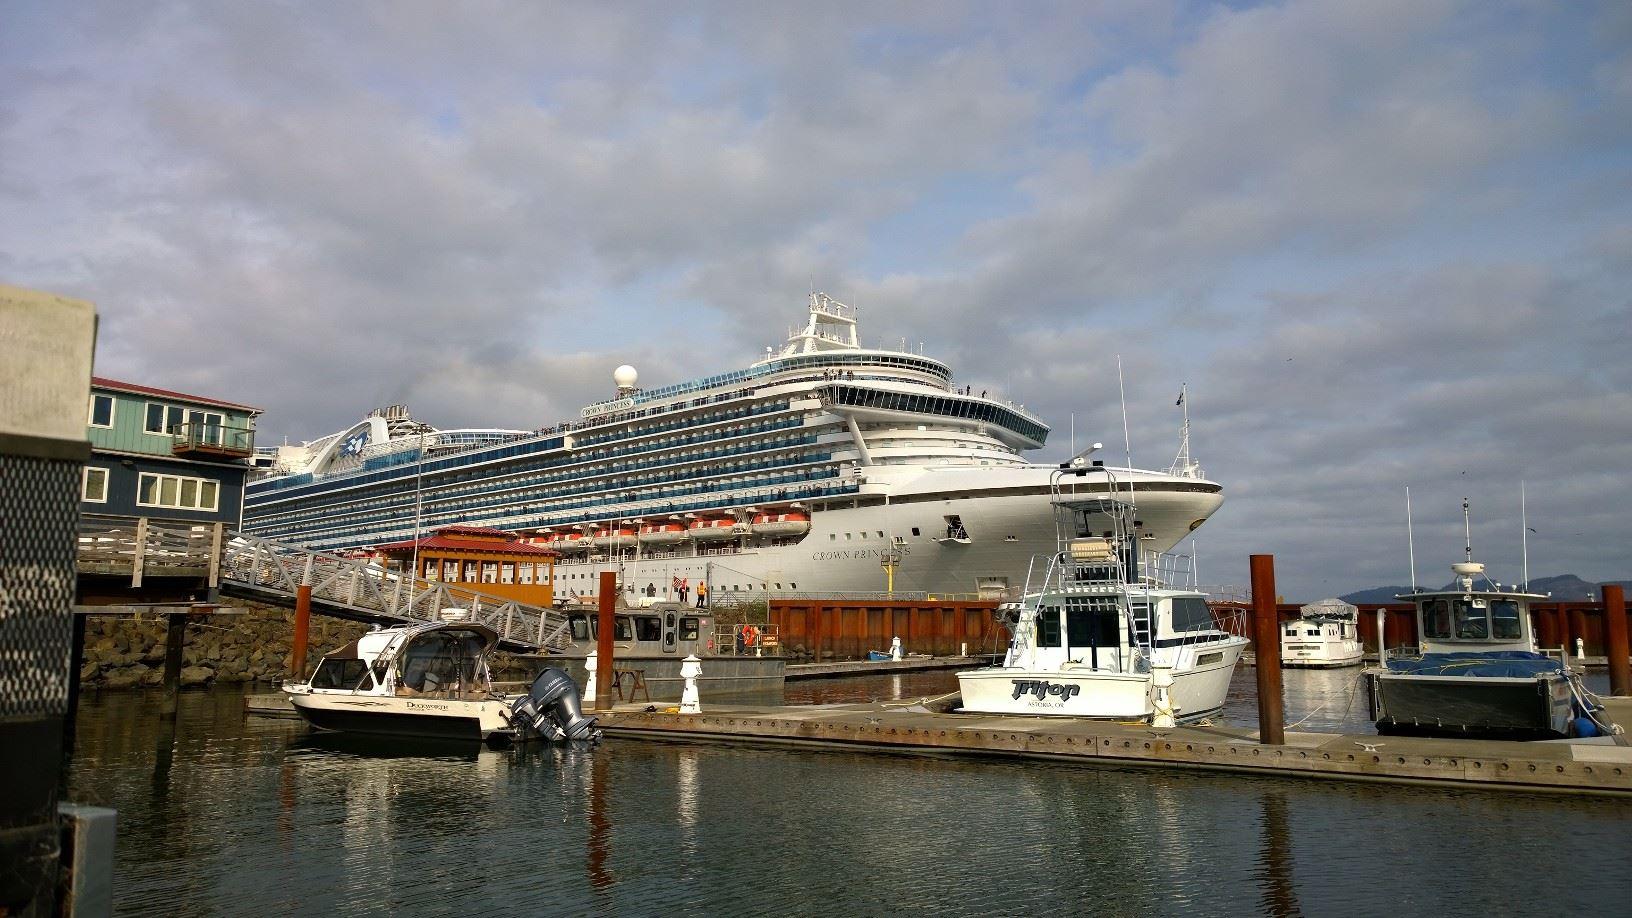 Port Of Astoria - Long beach cruise ship calendar